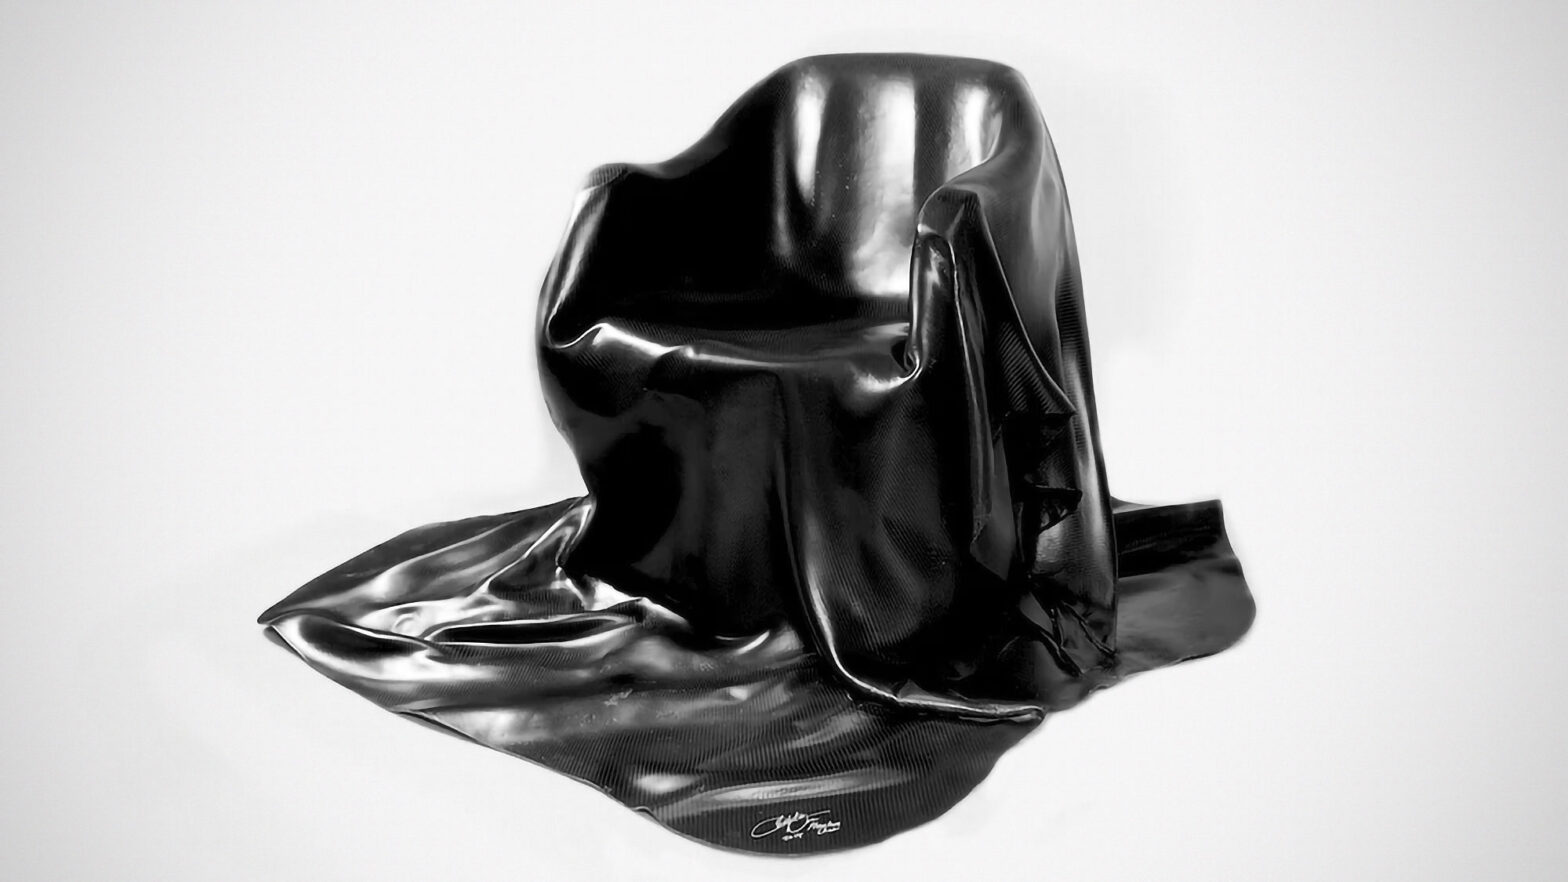 Alvarae Phantom Carbon Fiber Chair